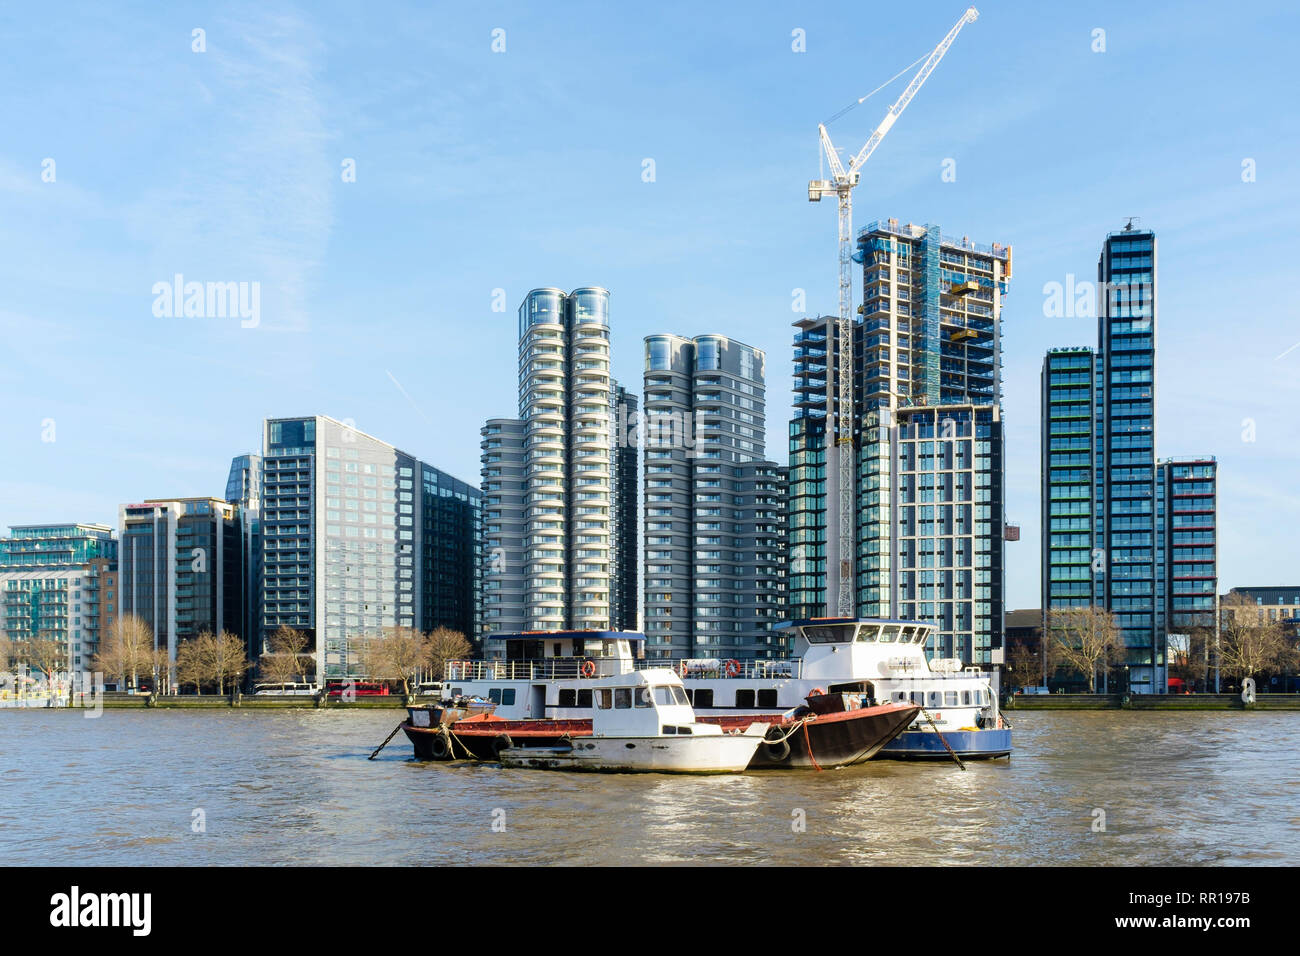 Upmarket riverside apartments, Albert Embankment, River Thames, London, UK (image C79NAW for site before development). - Stock Image